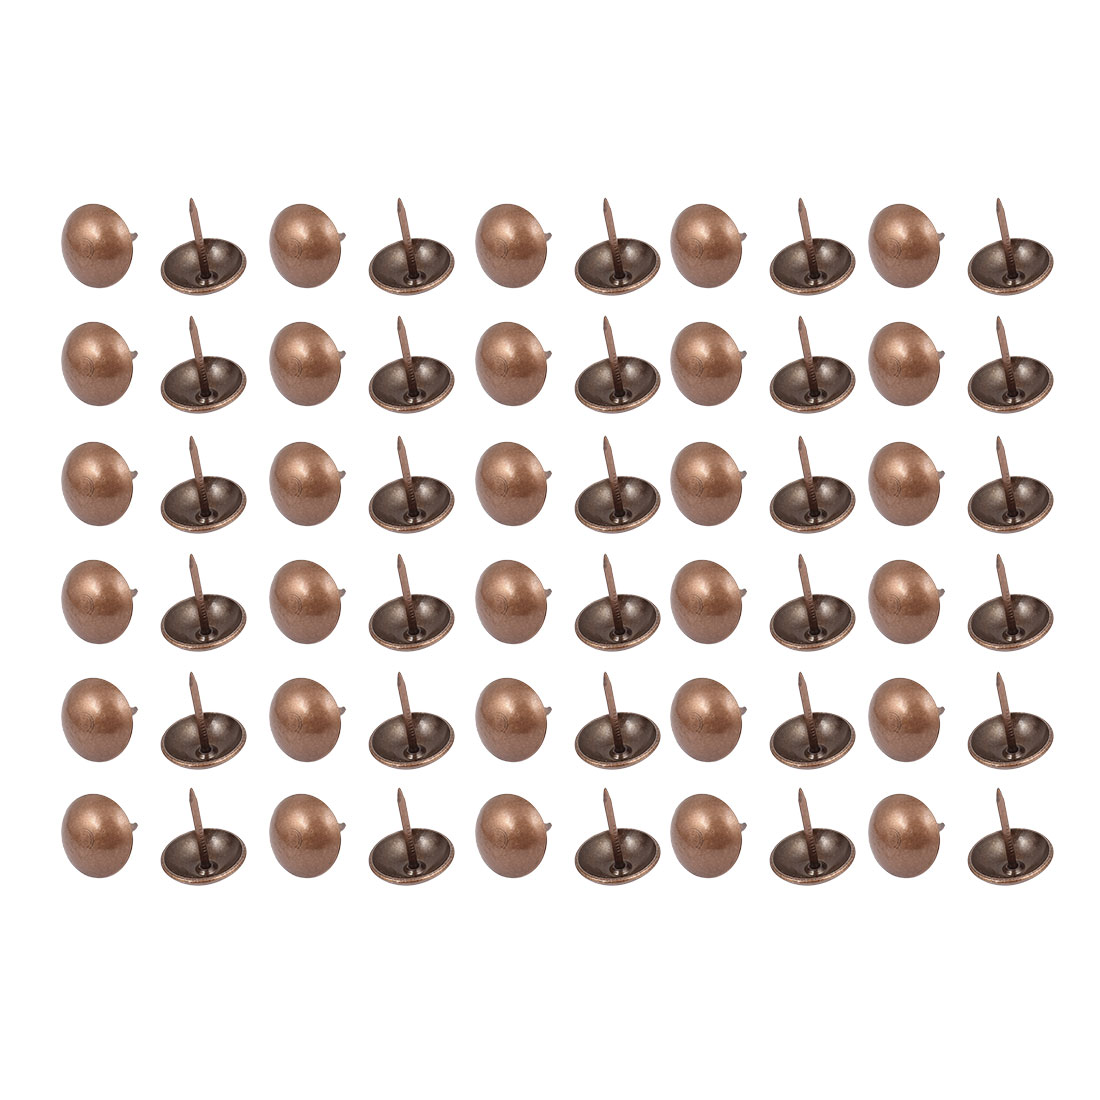 19mm Dia Metal Upholstery Nail Tack Stud Push Pin Doornail Copper Tone 60PCS